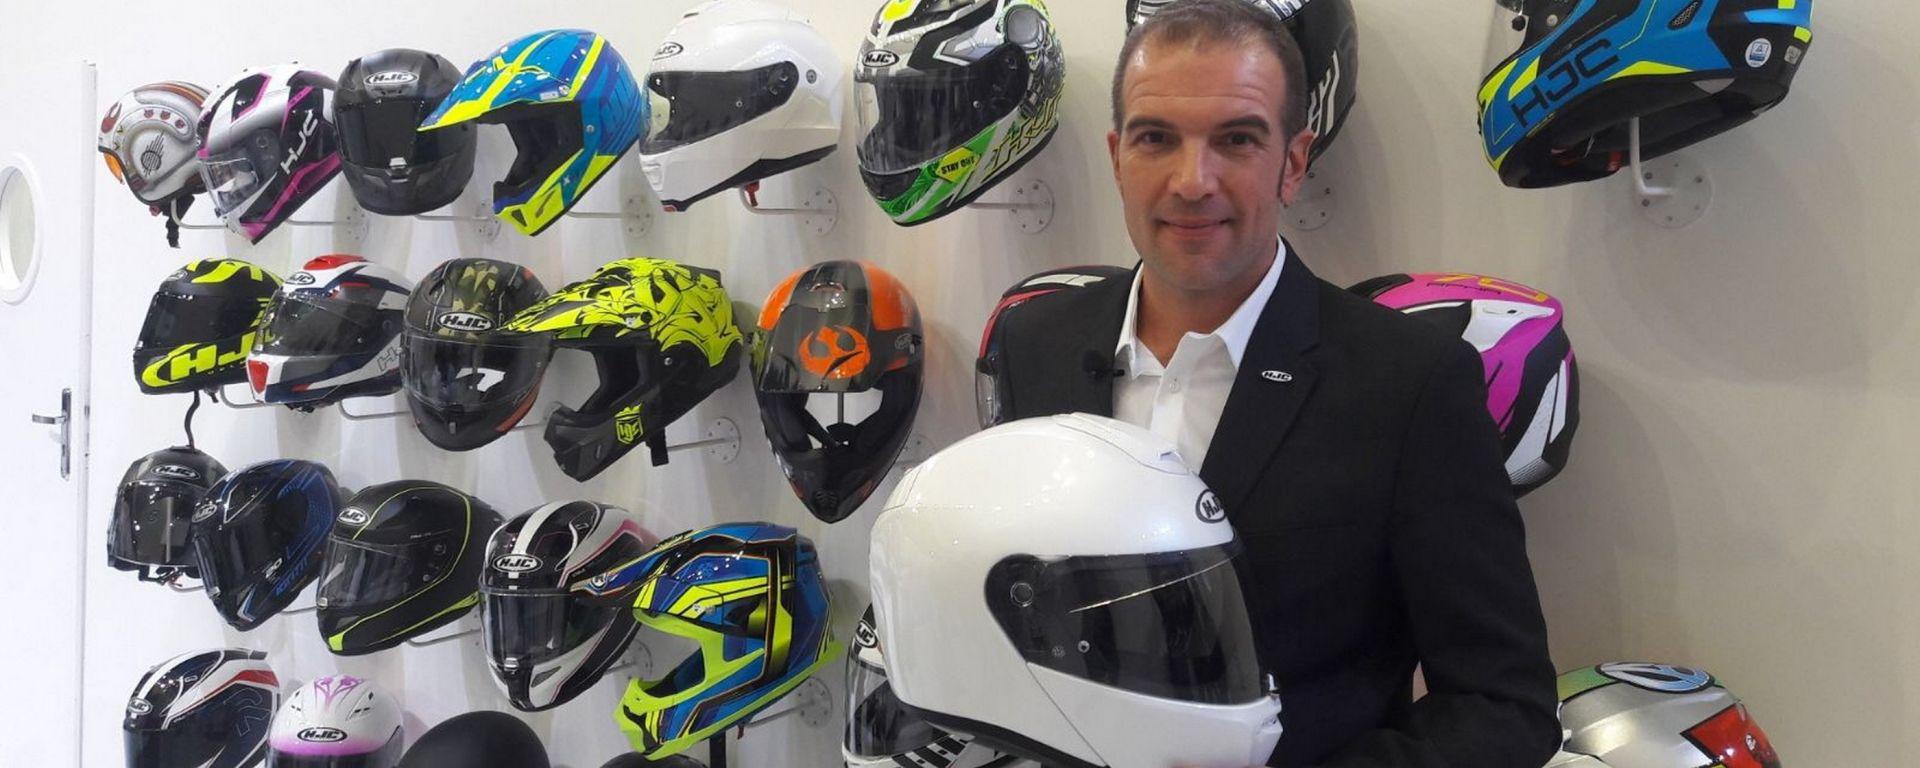 Fulvio Crivelli, Sales Manager HJC Italia